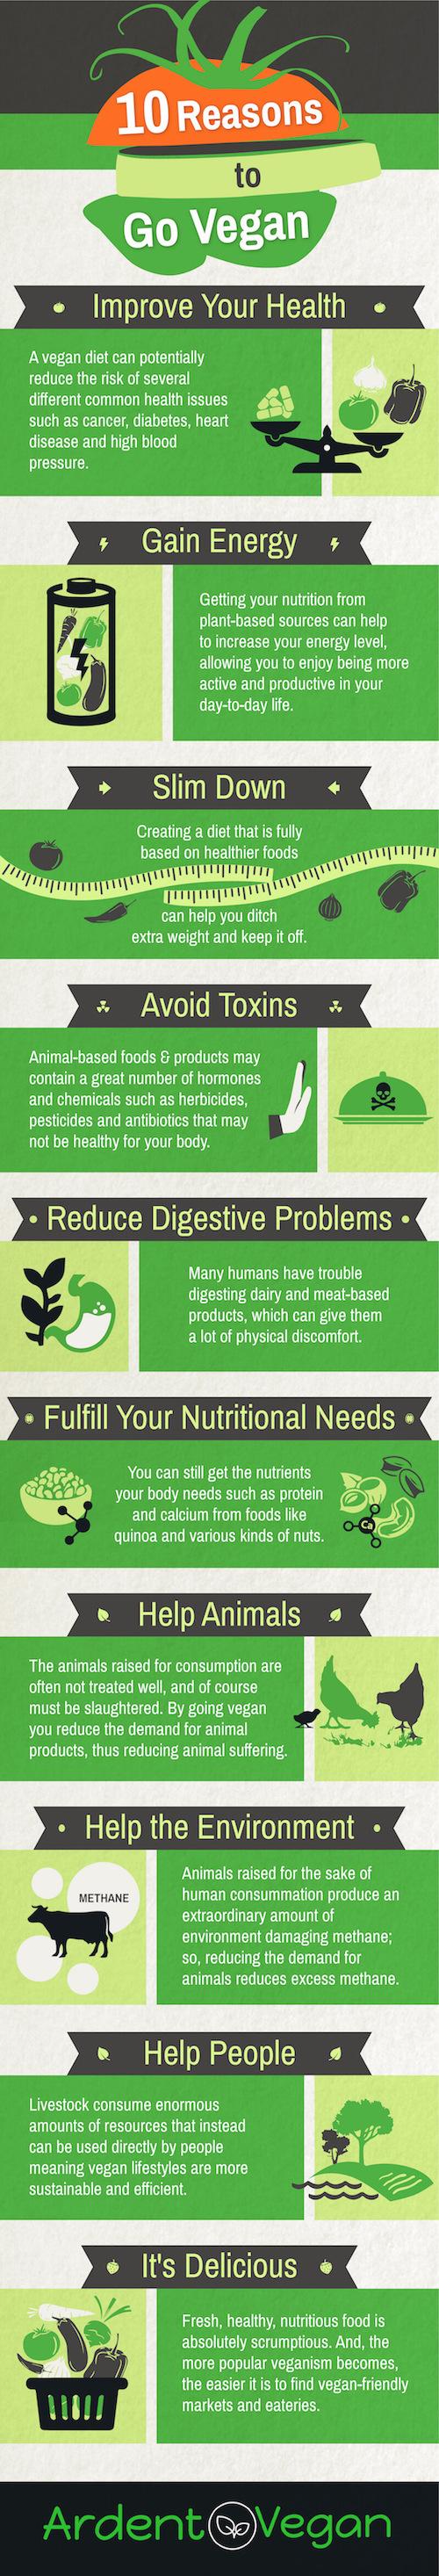 10-reasons-to-go-vegan